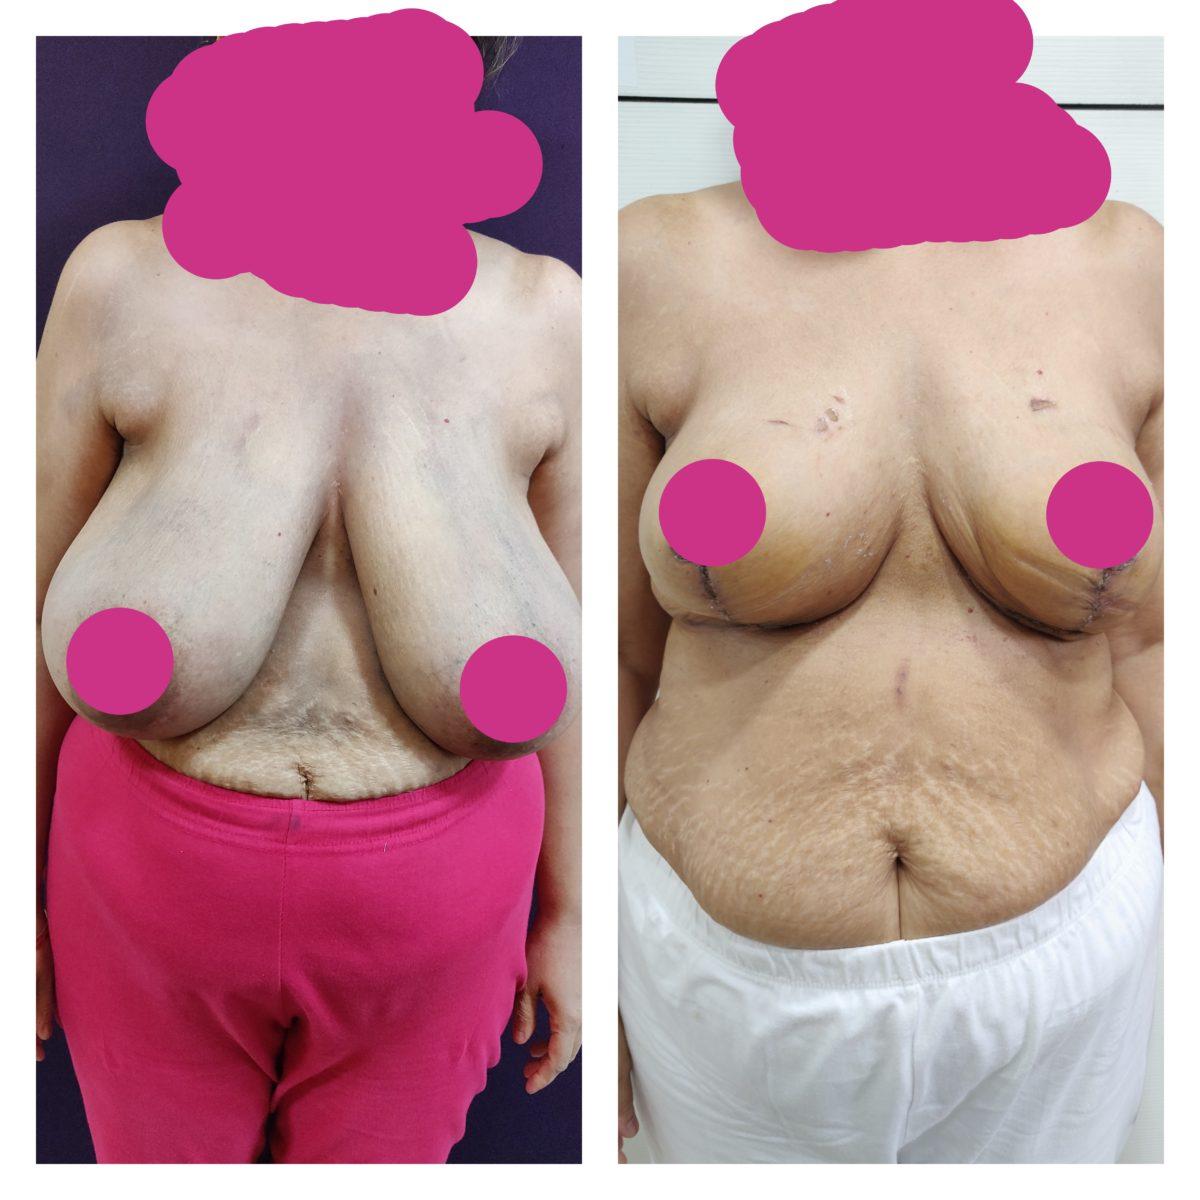 breast augmentation at The Venkat Center